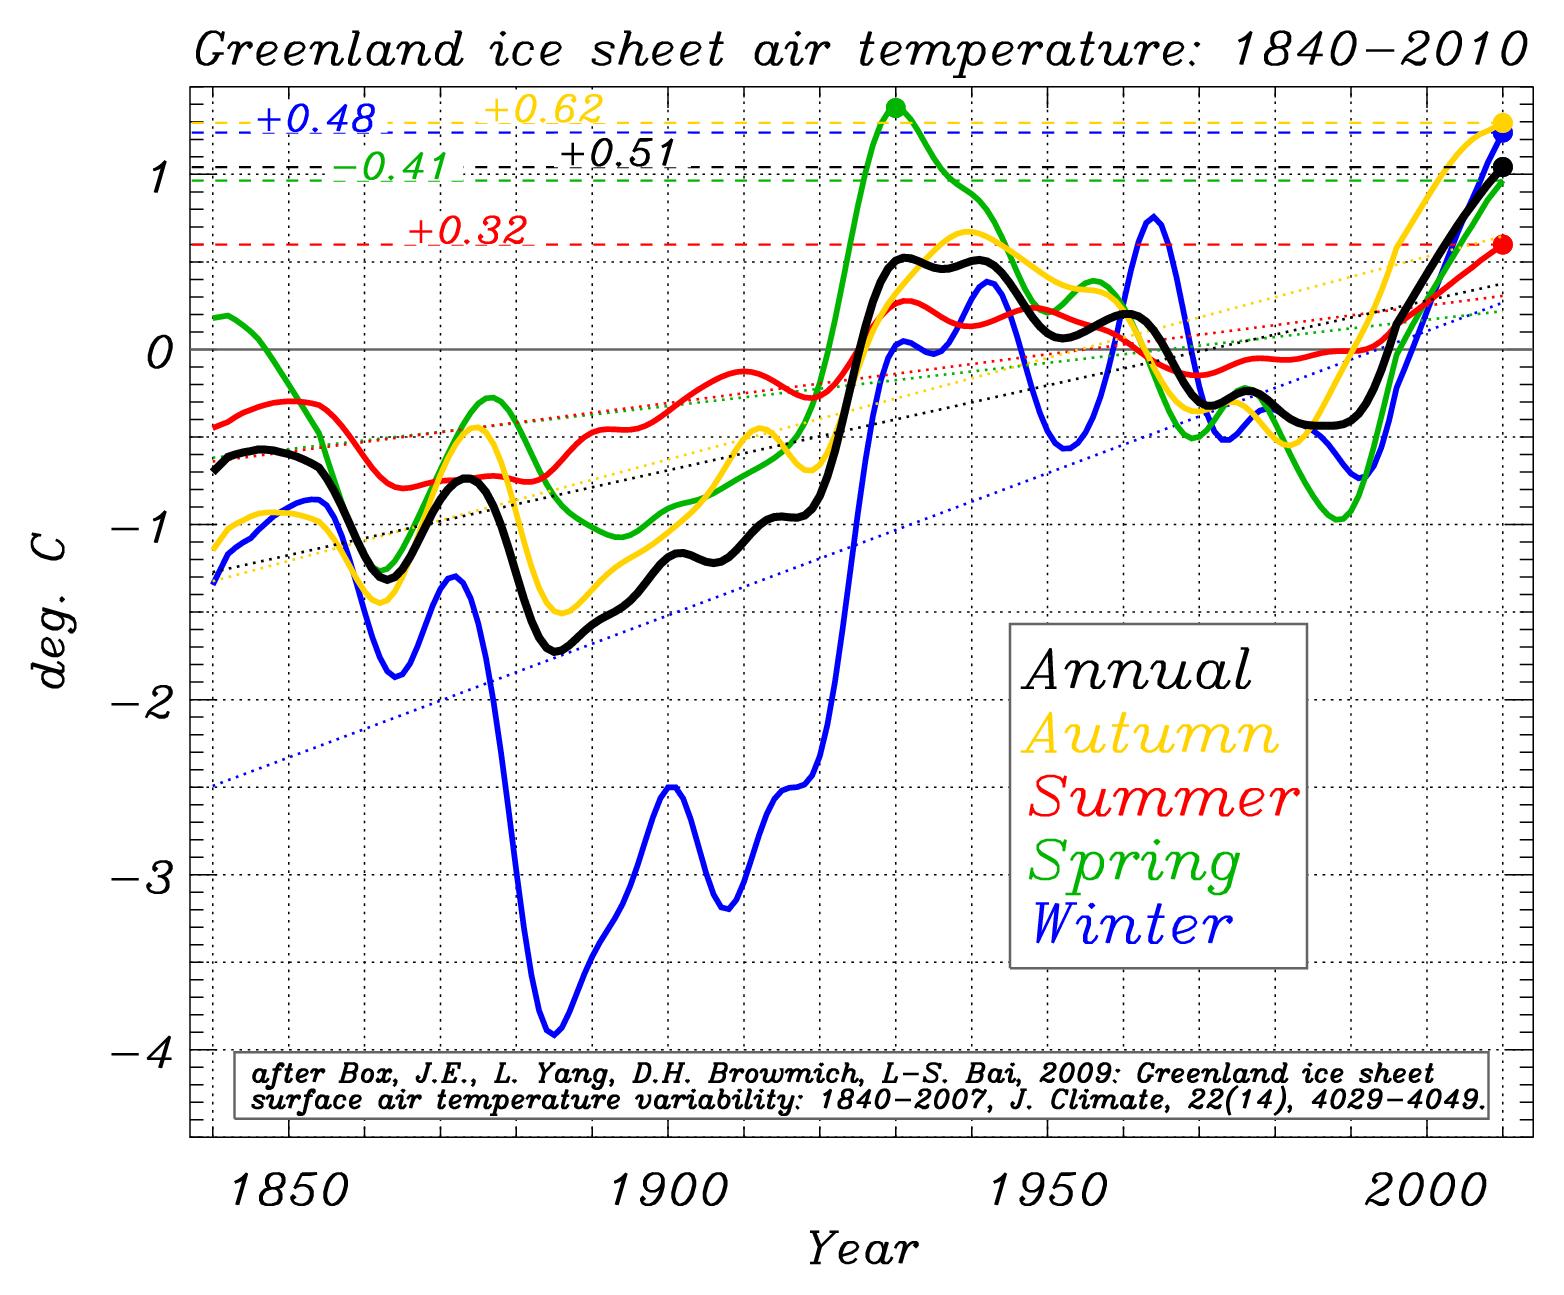 http://bprc.osu.edu/mediawiki/images/8/85/Greenland_seasonal_air_T_update_to_Box_et_al_2009.png